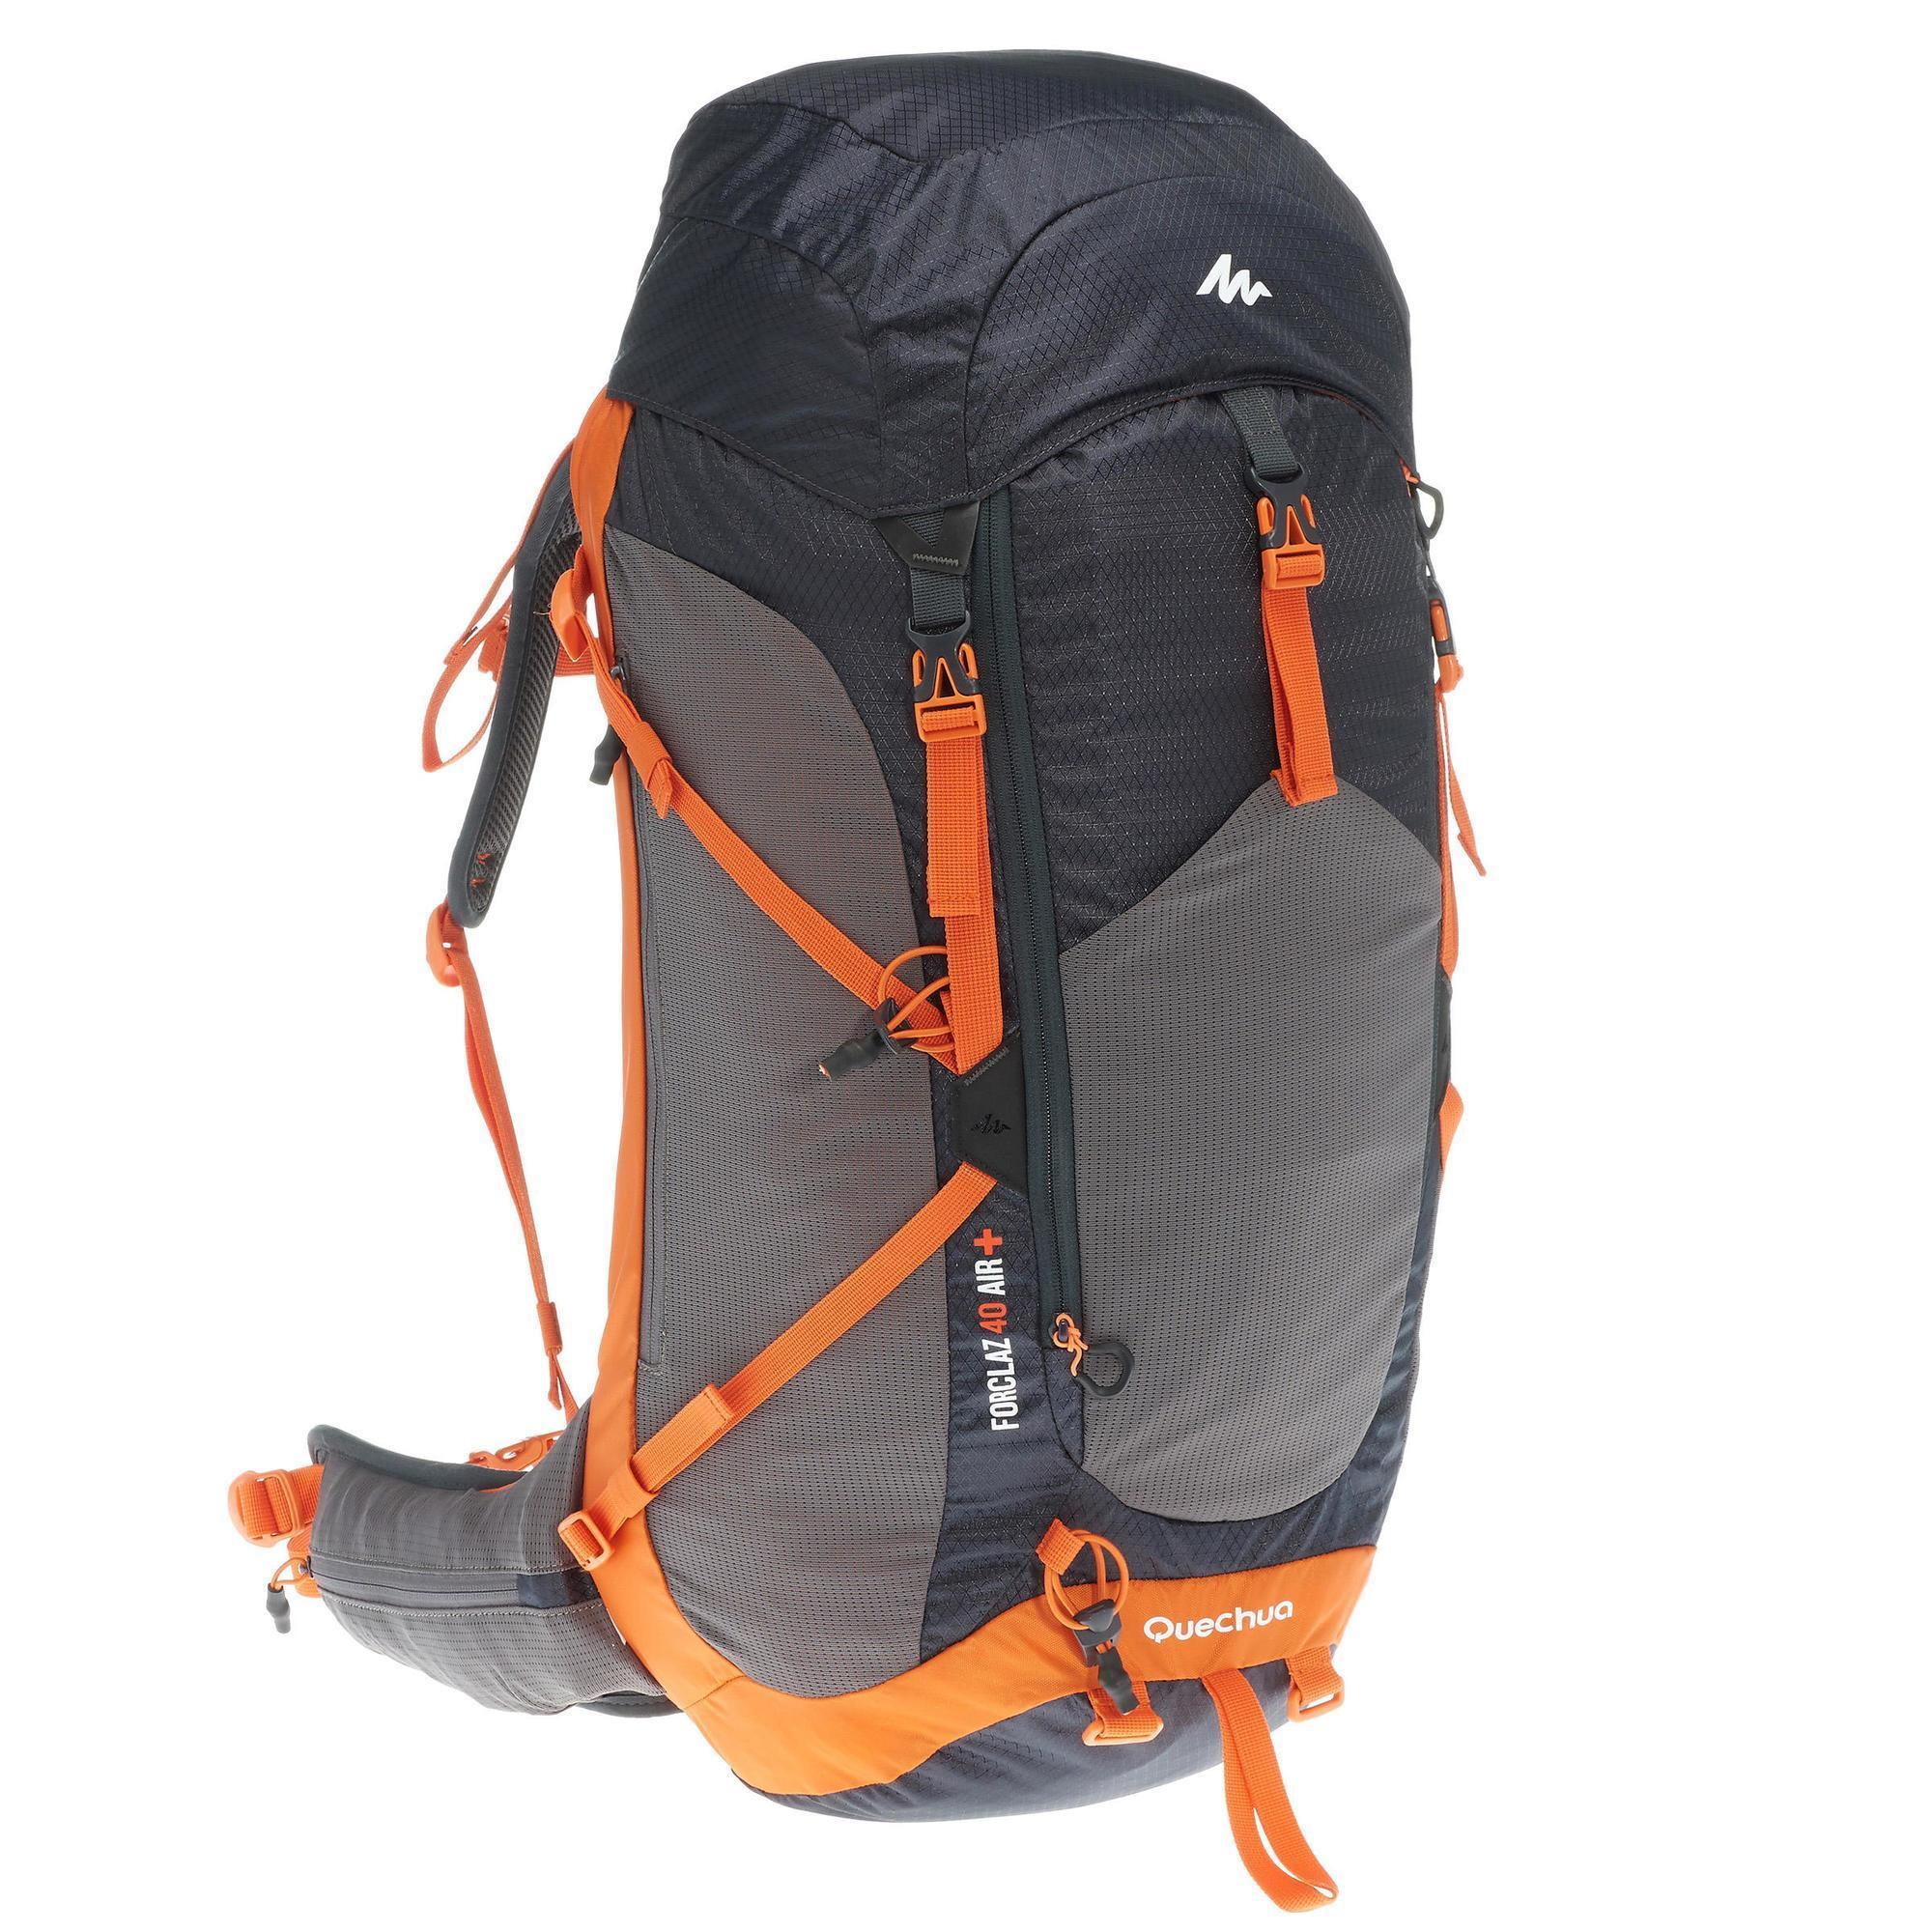 sac dos forclaz 40 litres air homme noir orange quechua. Black Bedroom Furniture Sets. Home Design Ideas